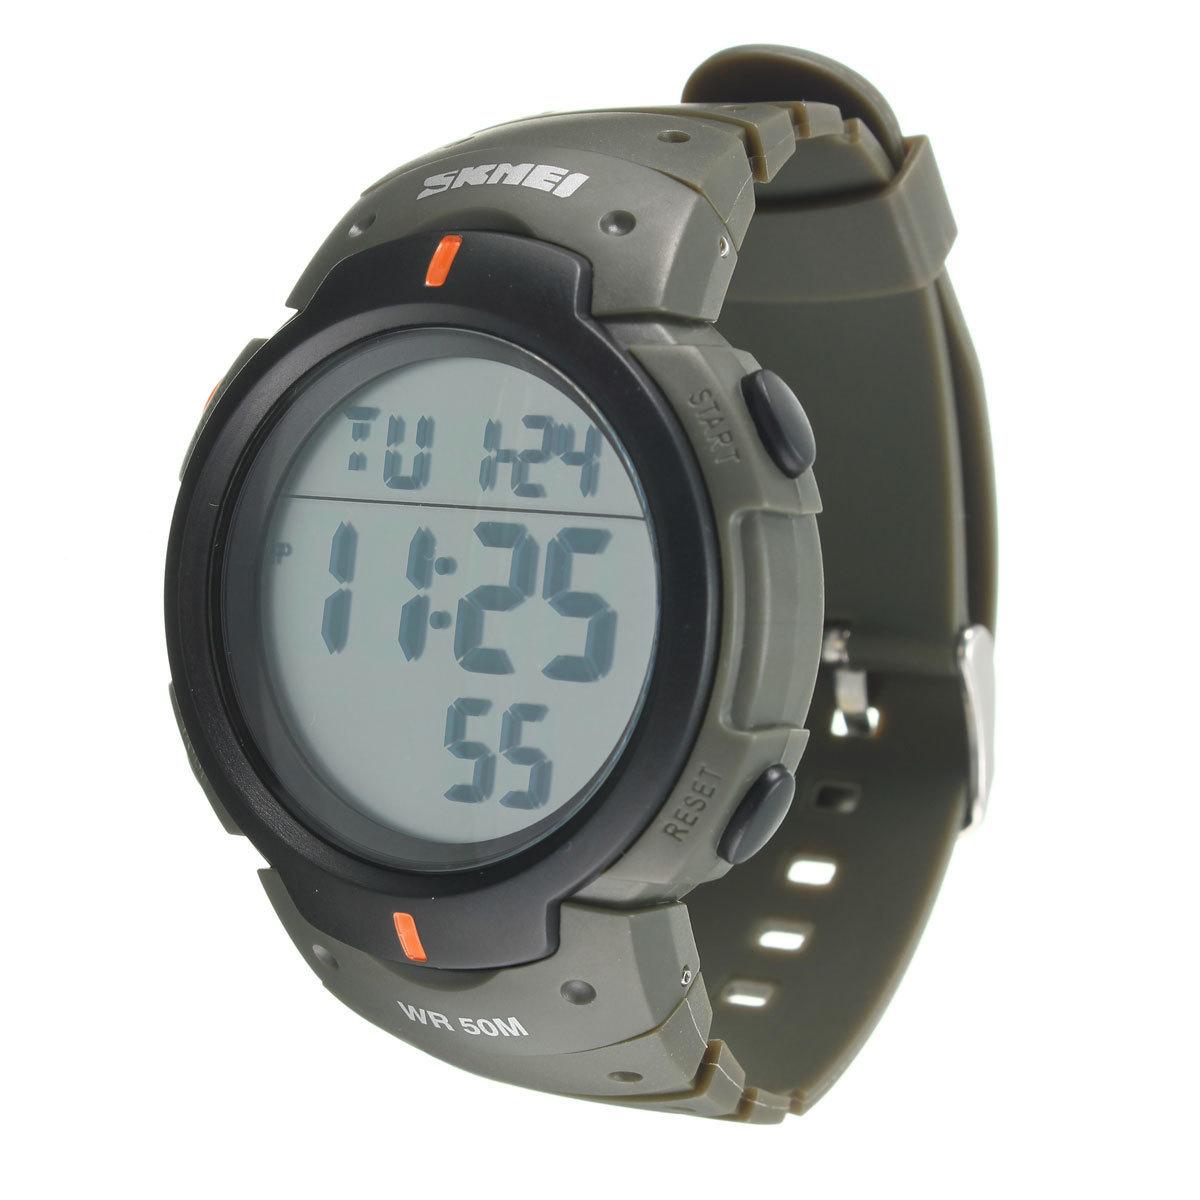 Diskon Skmei Tahan Air Led Light Digital Tanggal Alarm Lcd Wrist Watch Pria Wanita Olahraga